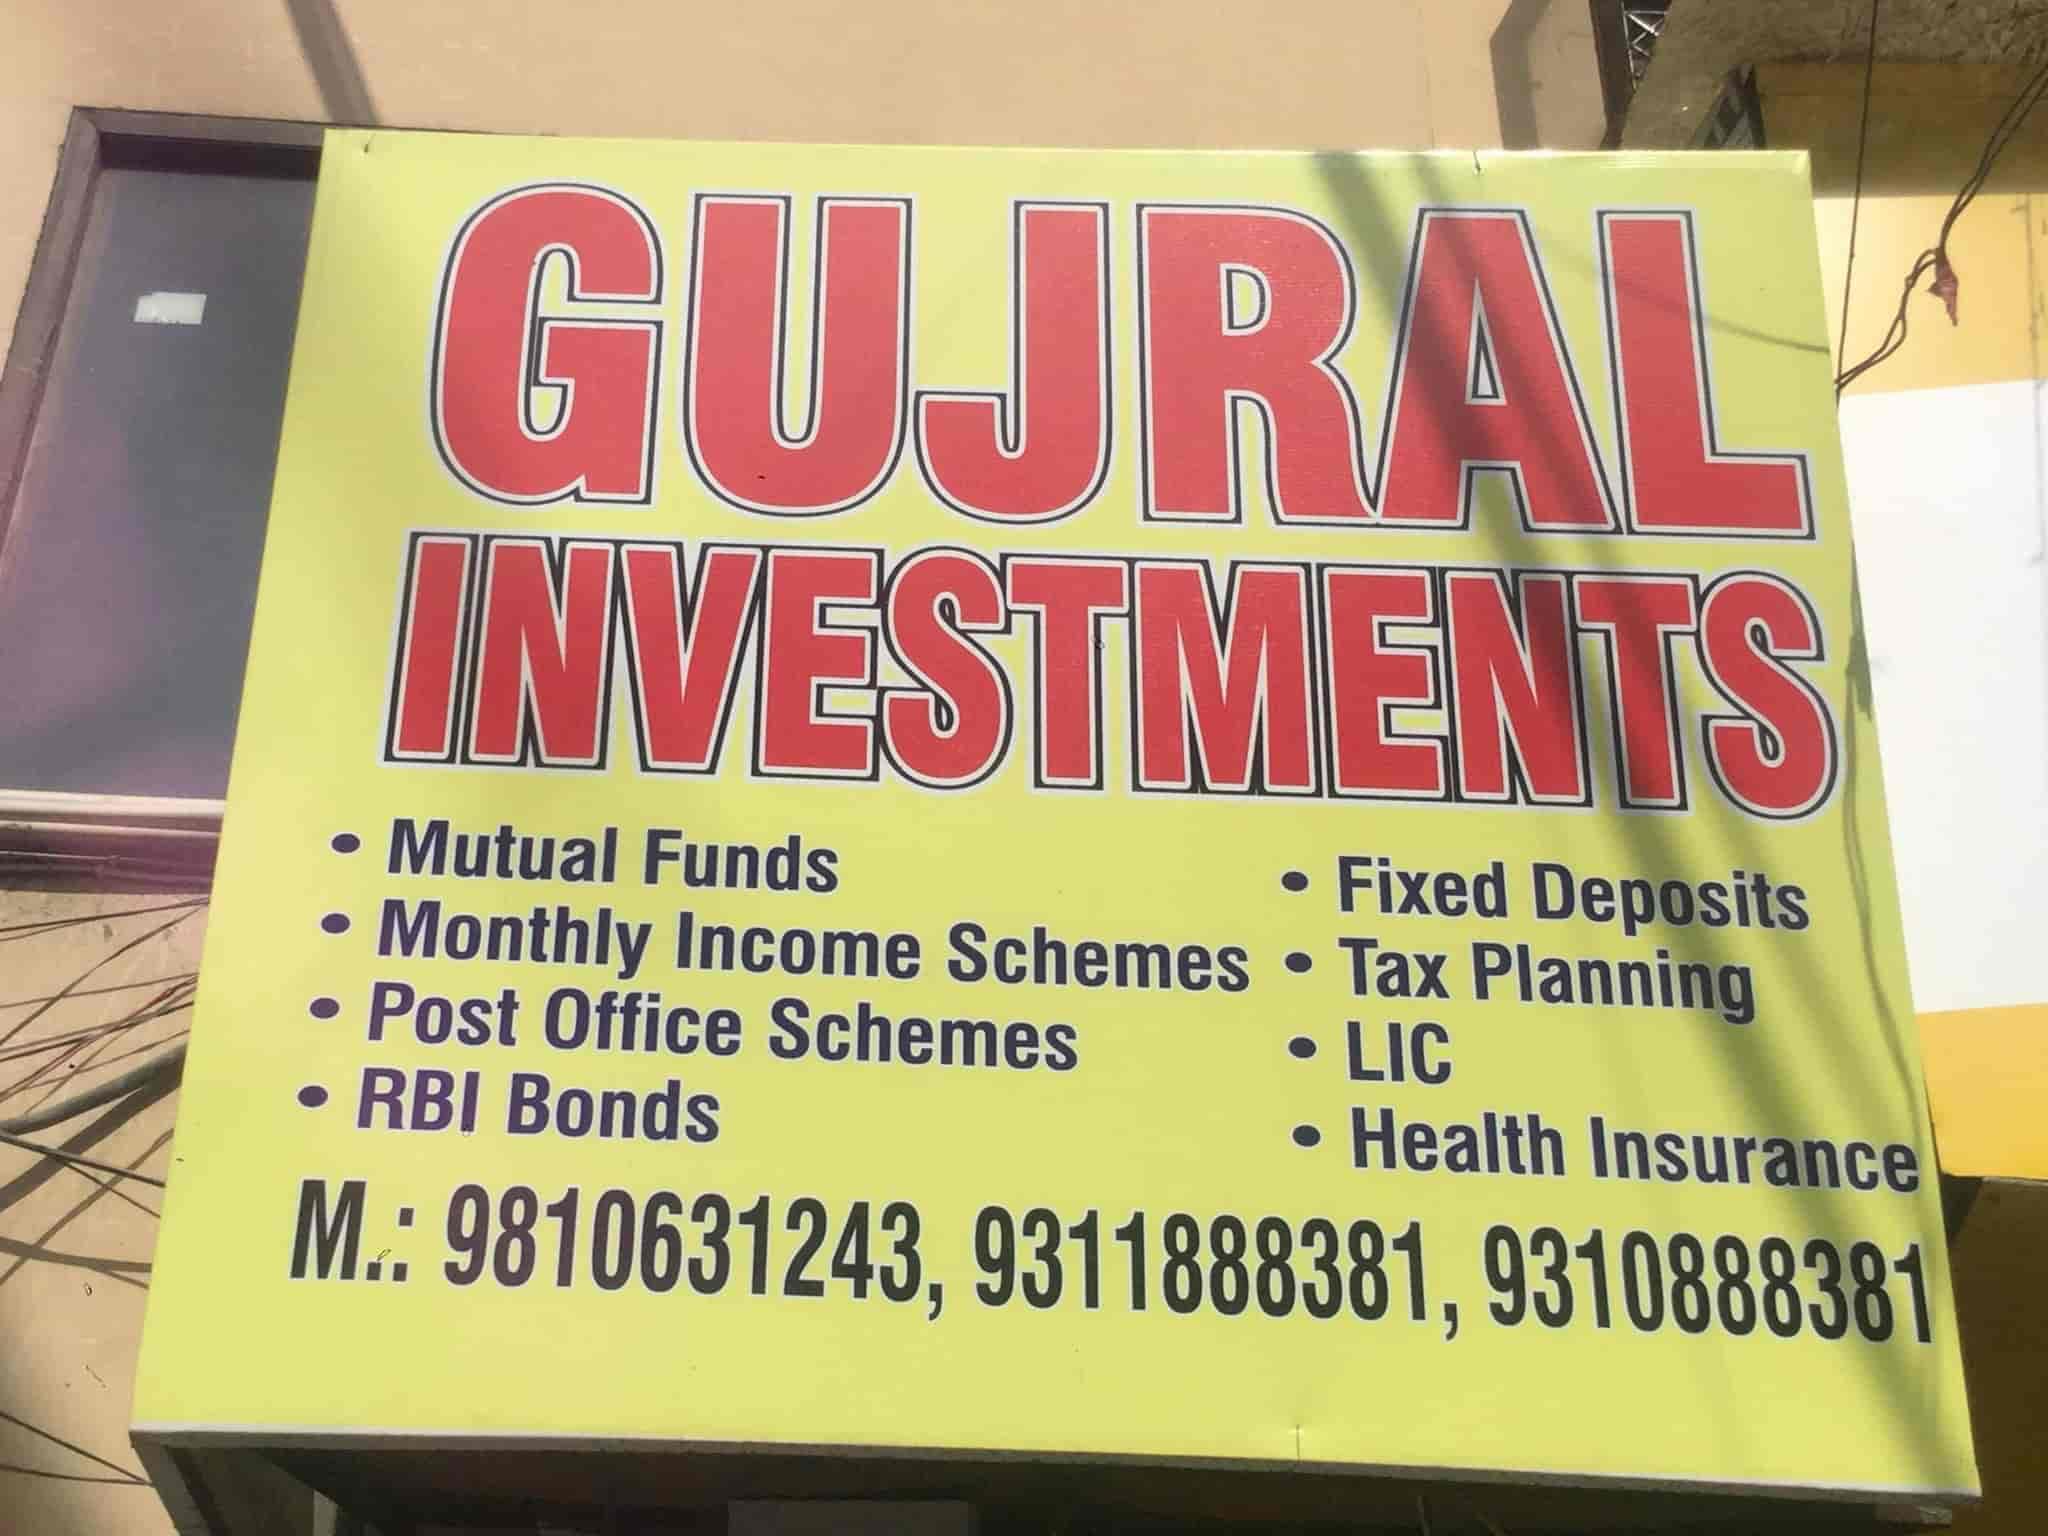 Gujral Investments Photos, Malviya Nagar, Delhi- Pictures